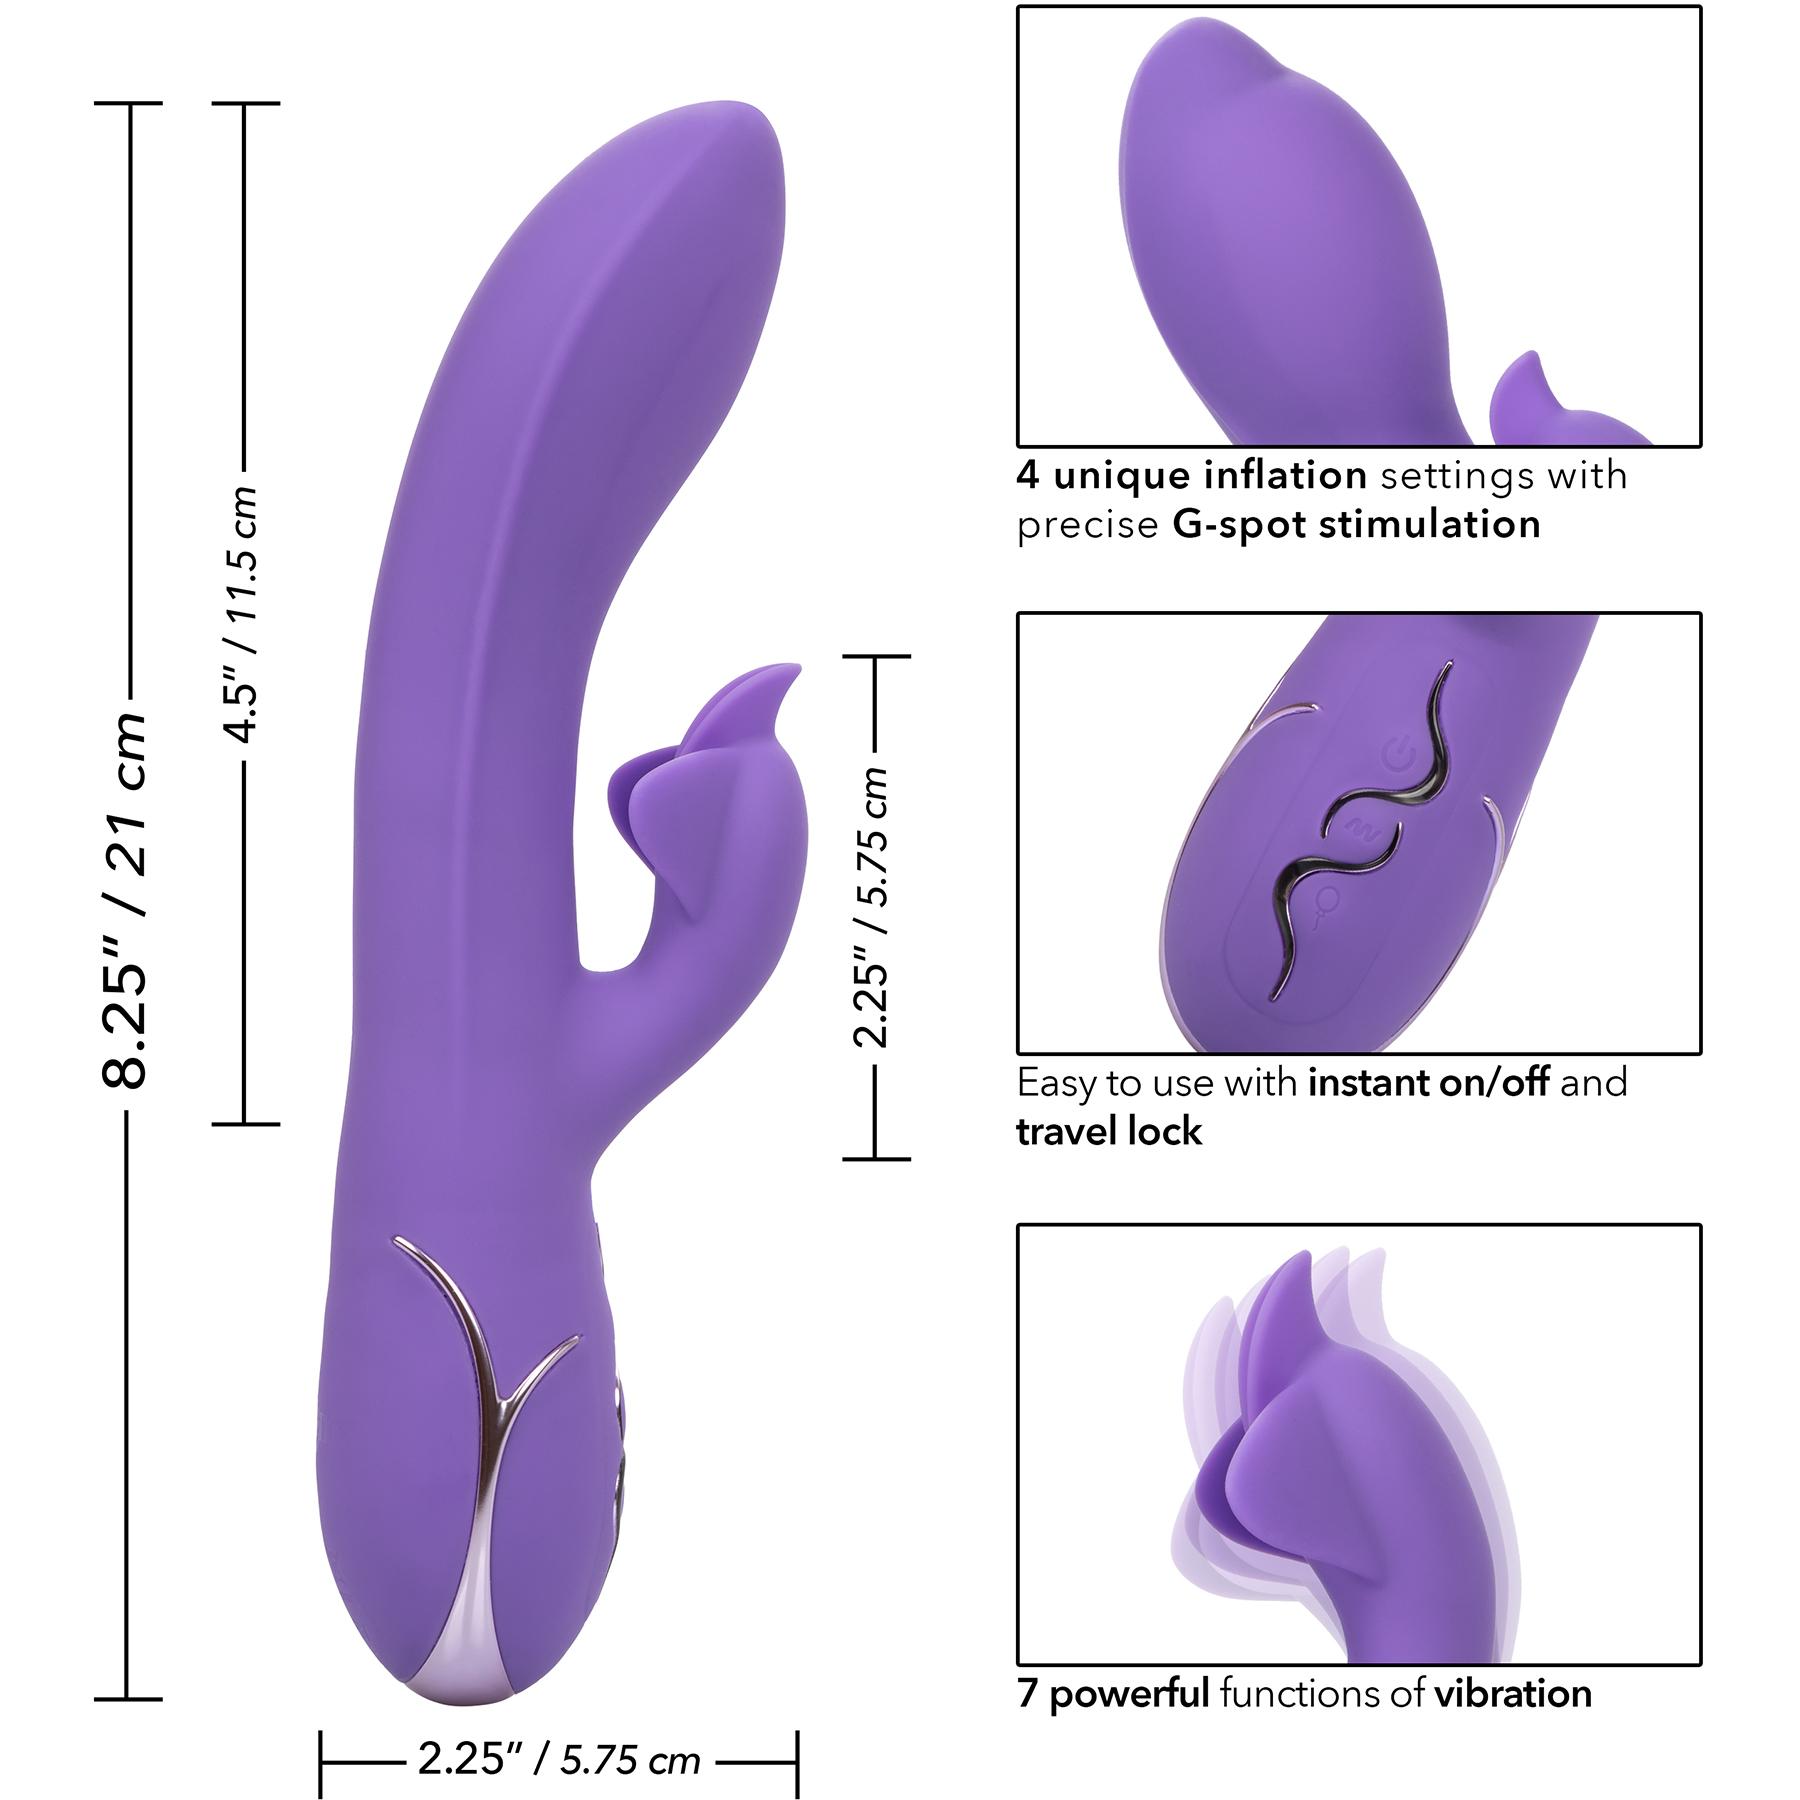 Insatiable G Inflatable G-Flutter Rabbit Style Silicone Vibrator - Measurements